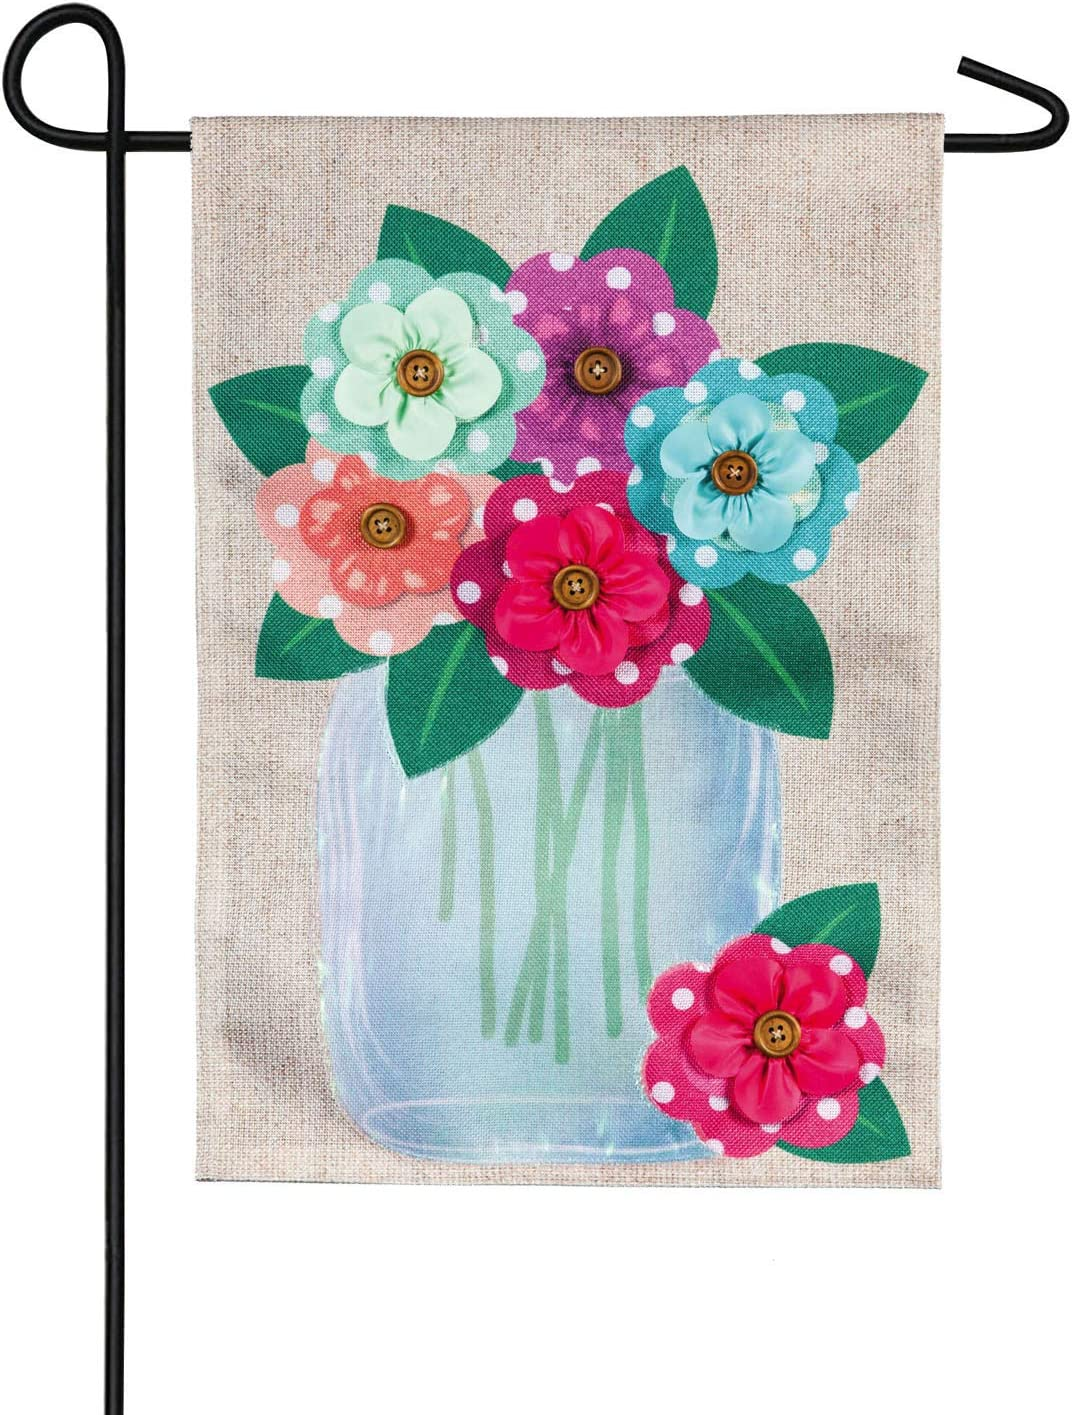 Polka Dot Floral Mason Jar Garden Burlap Flag - 13 x 1 x 18 Inches